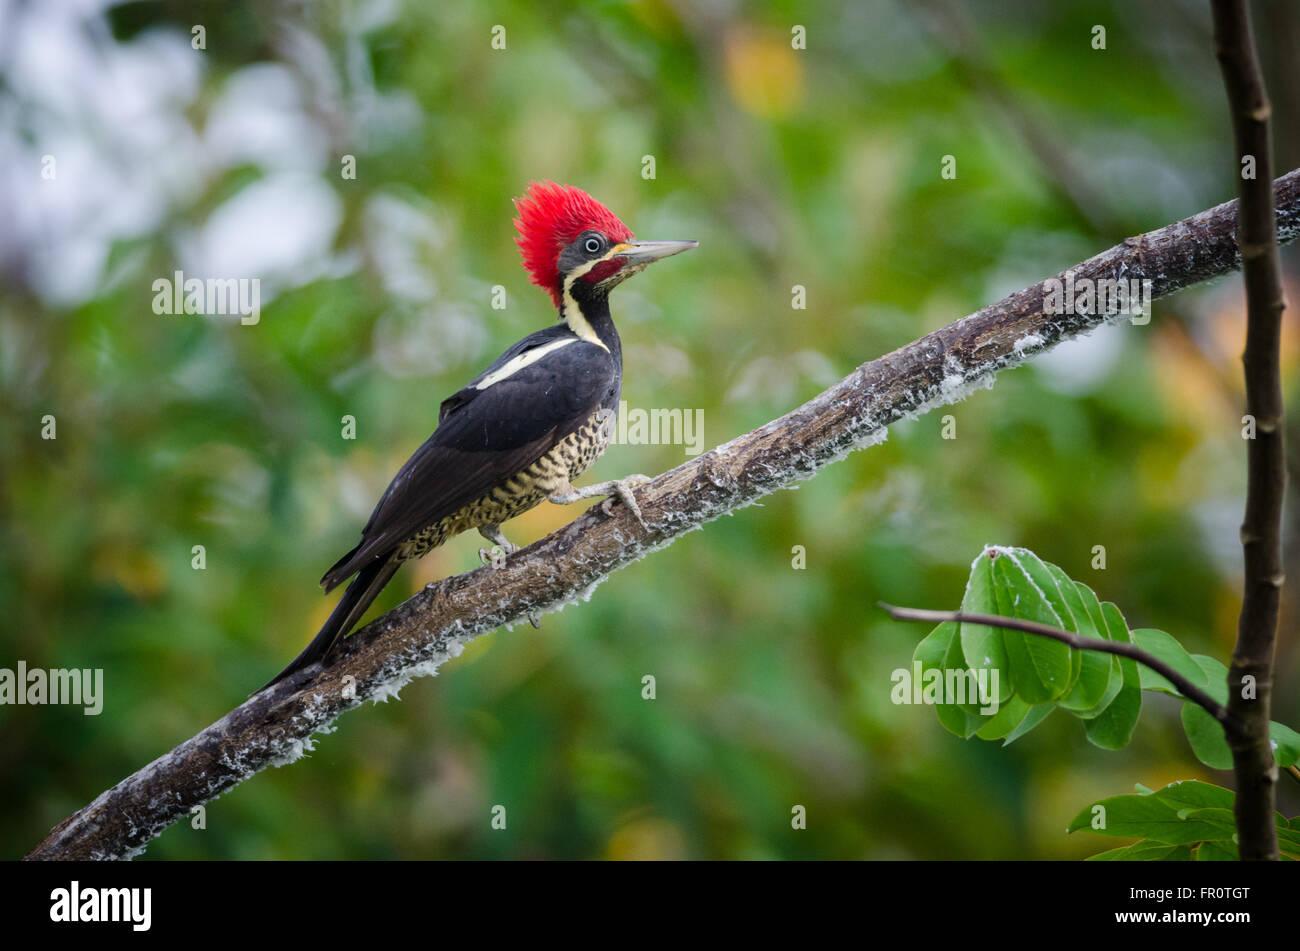 Lineated Woodpecker (Dryocopus lineatus), Cano Negro, Costa Rica - Stock Image